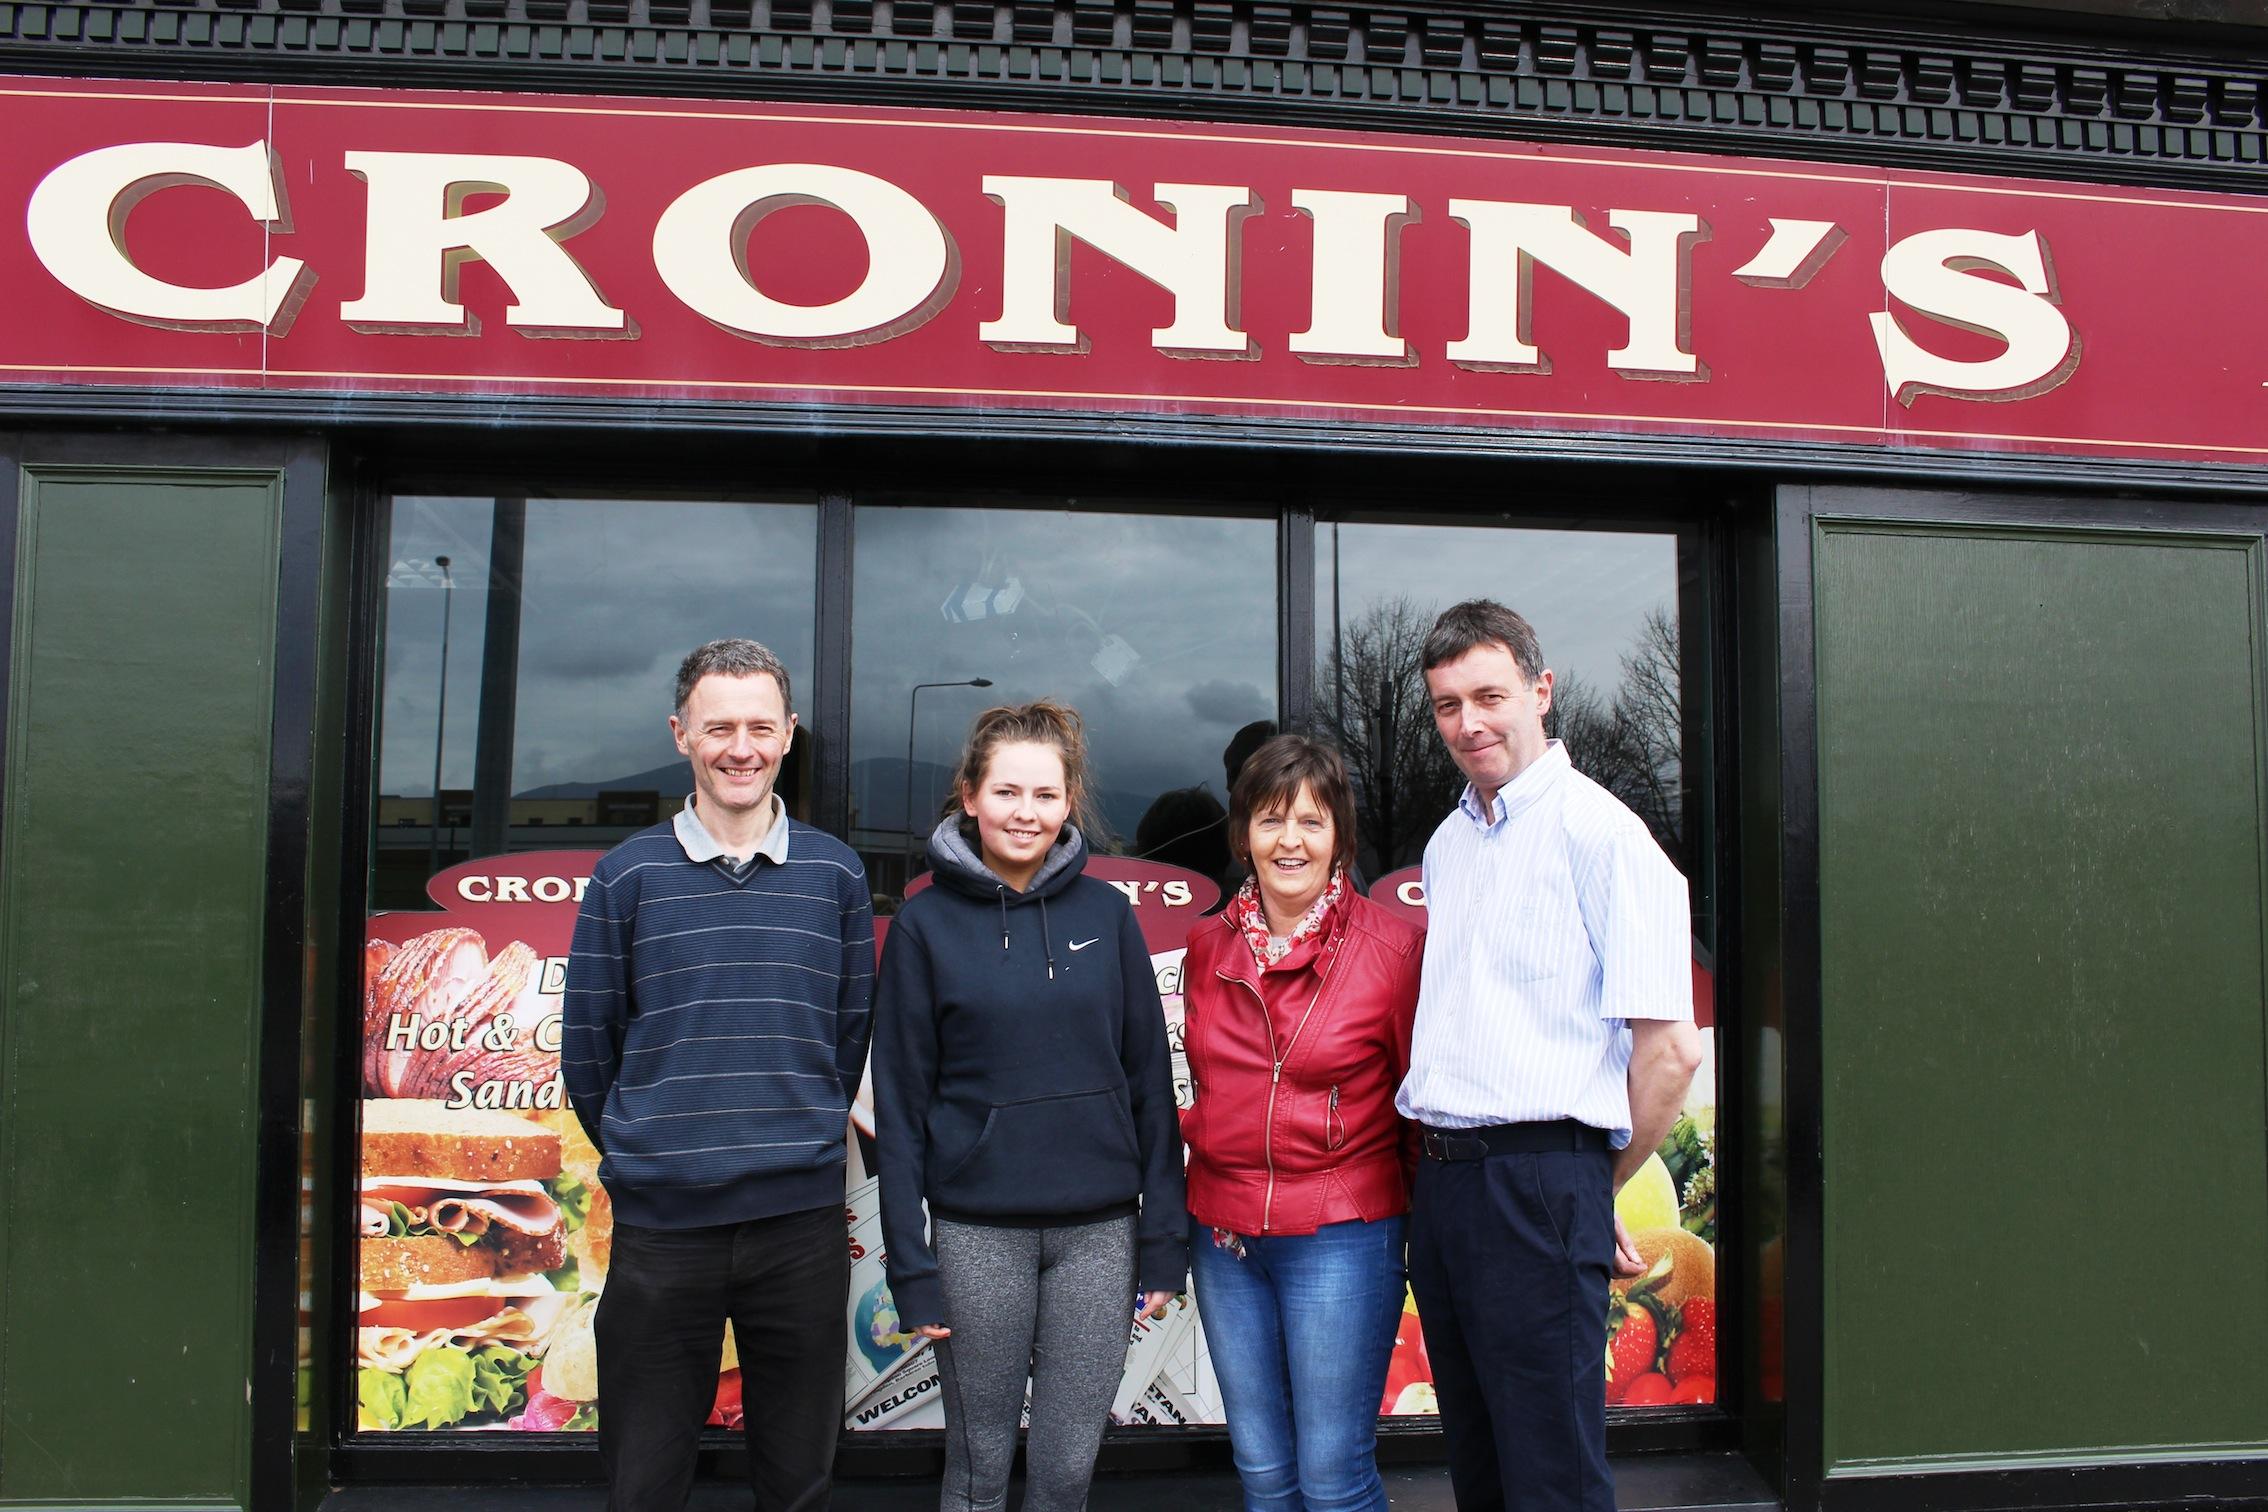 Gene, Sarah, Marie and Patrick Cronin outside Cronin's Shop.